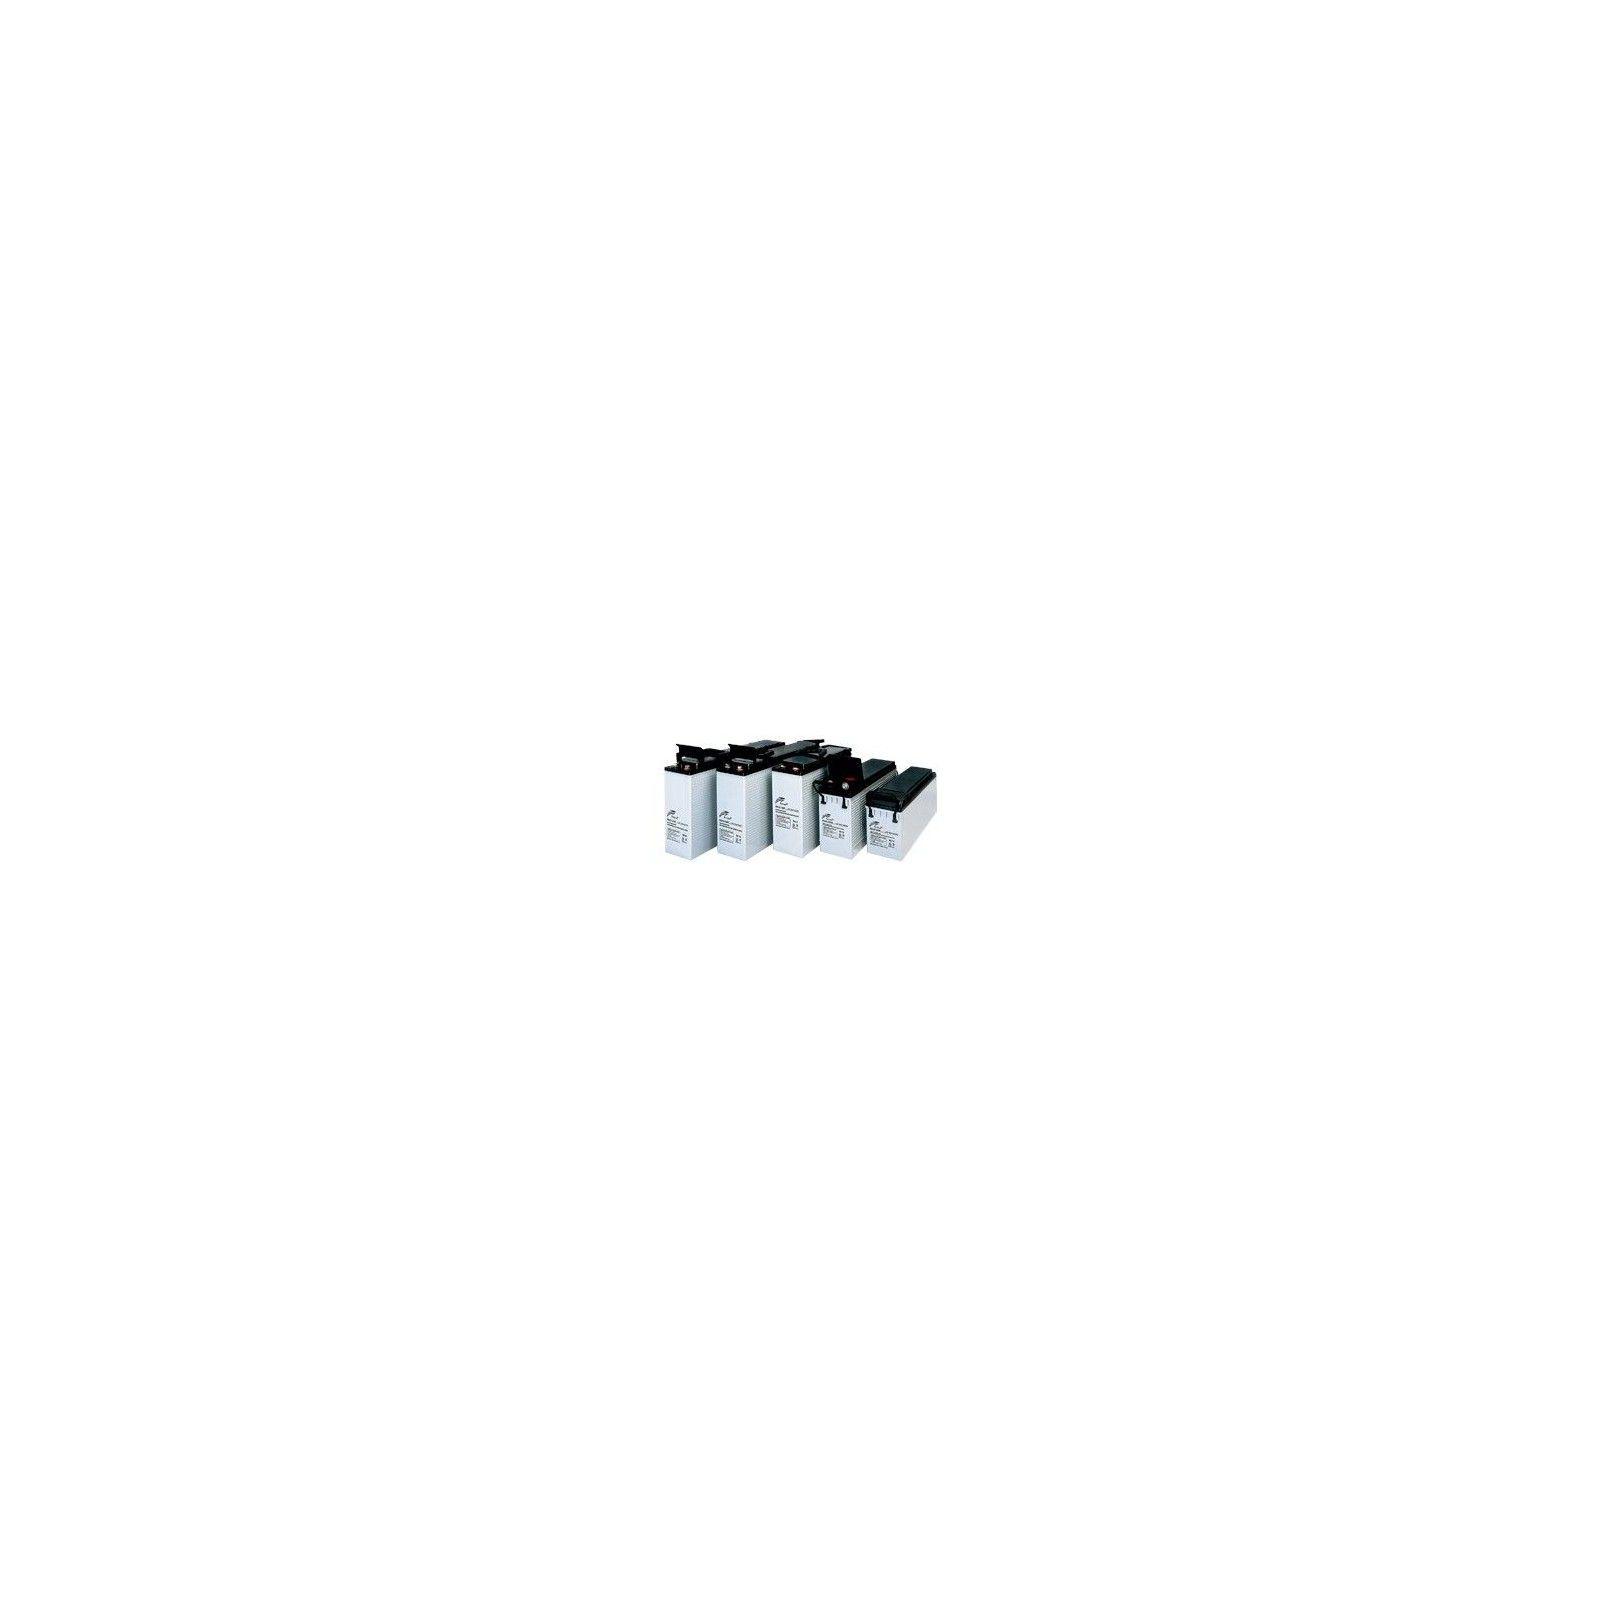 Batería Ritar FT12-160A 160Ah 12V Ft RITAR - 1